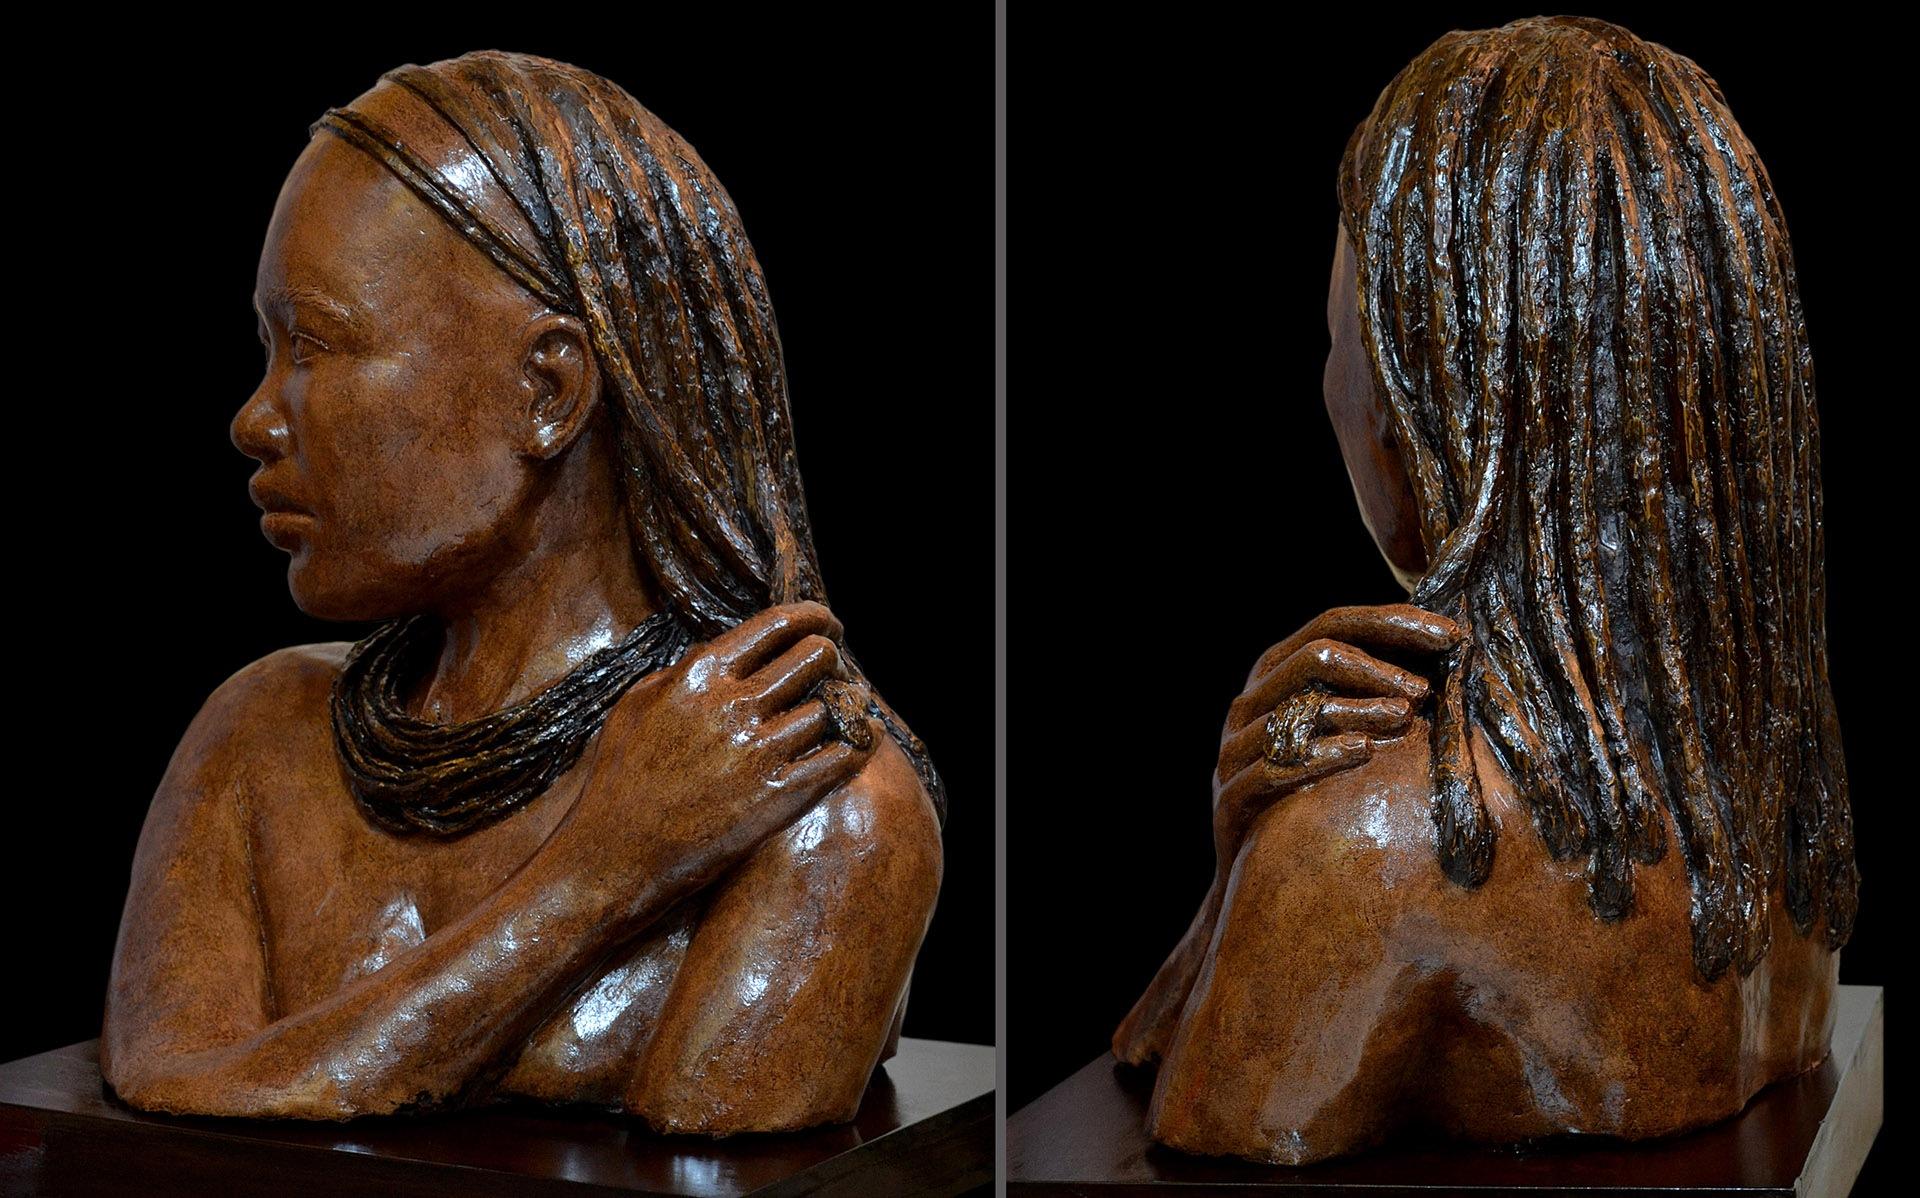 Himba. Escayola, 45 x 35 cm, Javier Olmedo. 2015